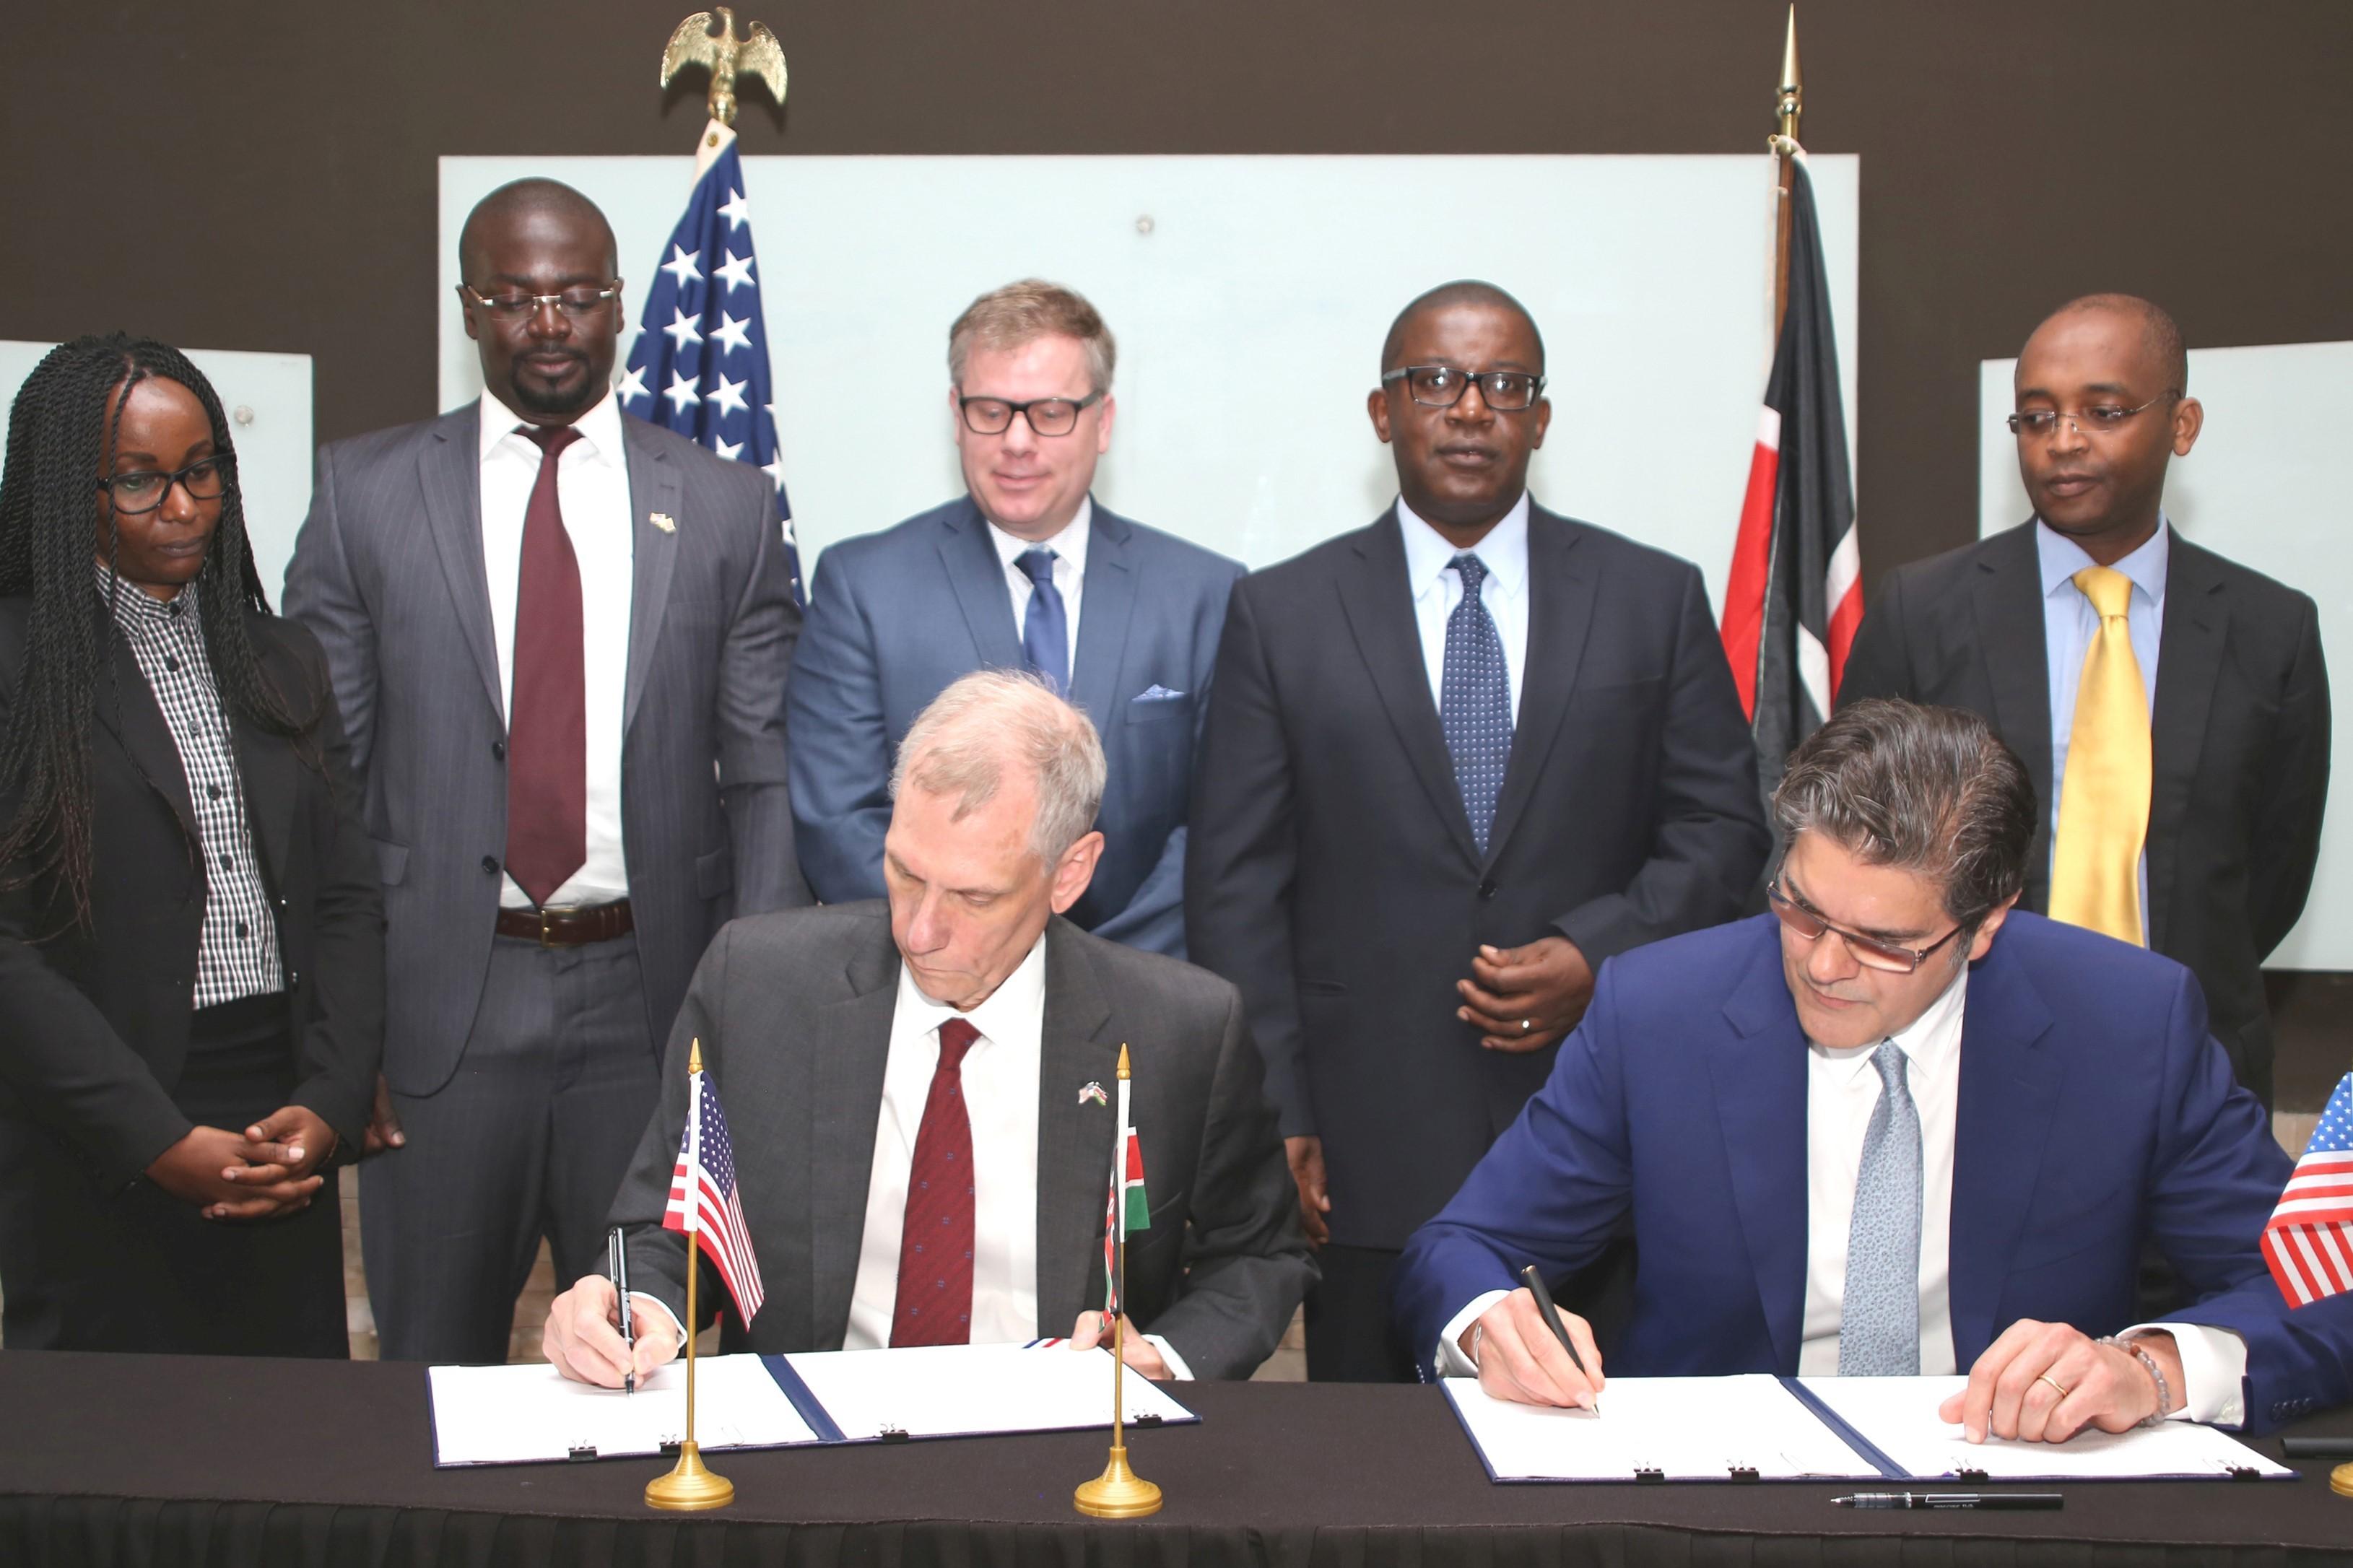 U.S. Ambassador to Kenya, Robert F. Godec, signs the grants on behalf of USTDA, along with Xago Africa Managing Director, Paul W. Webb. (Photo: Business Wire)